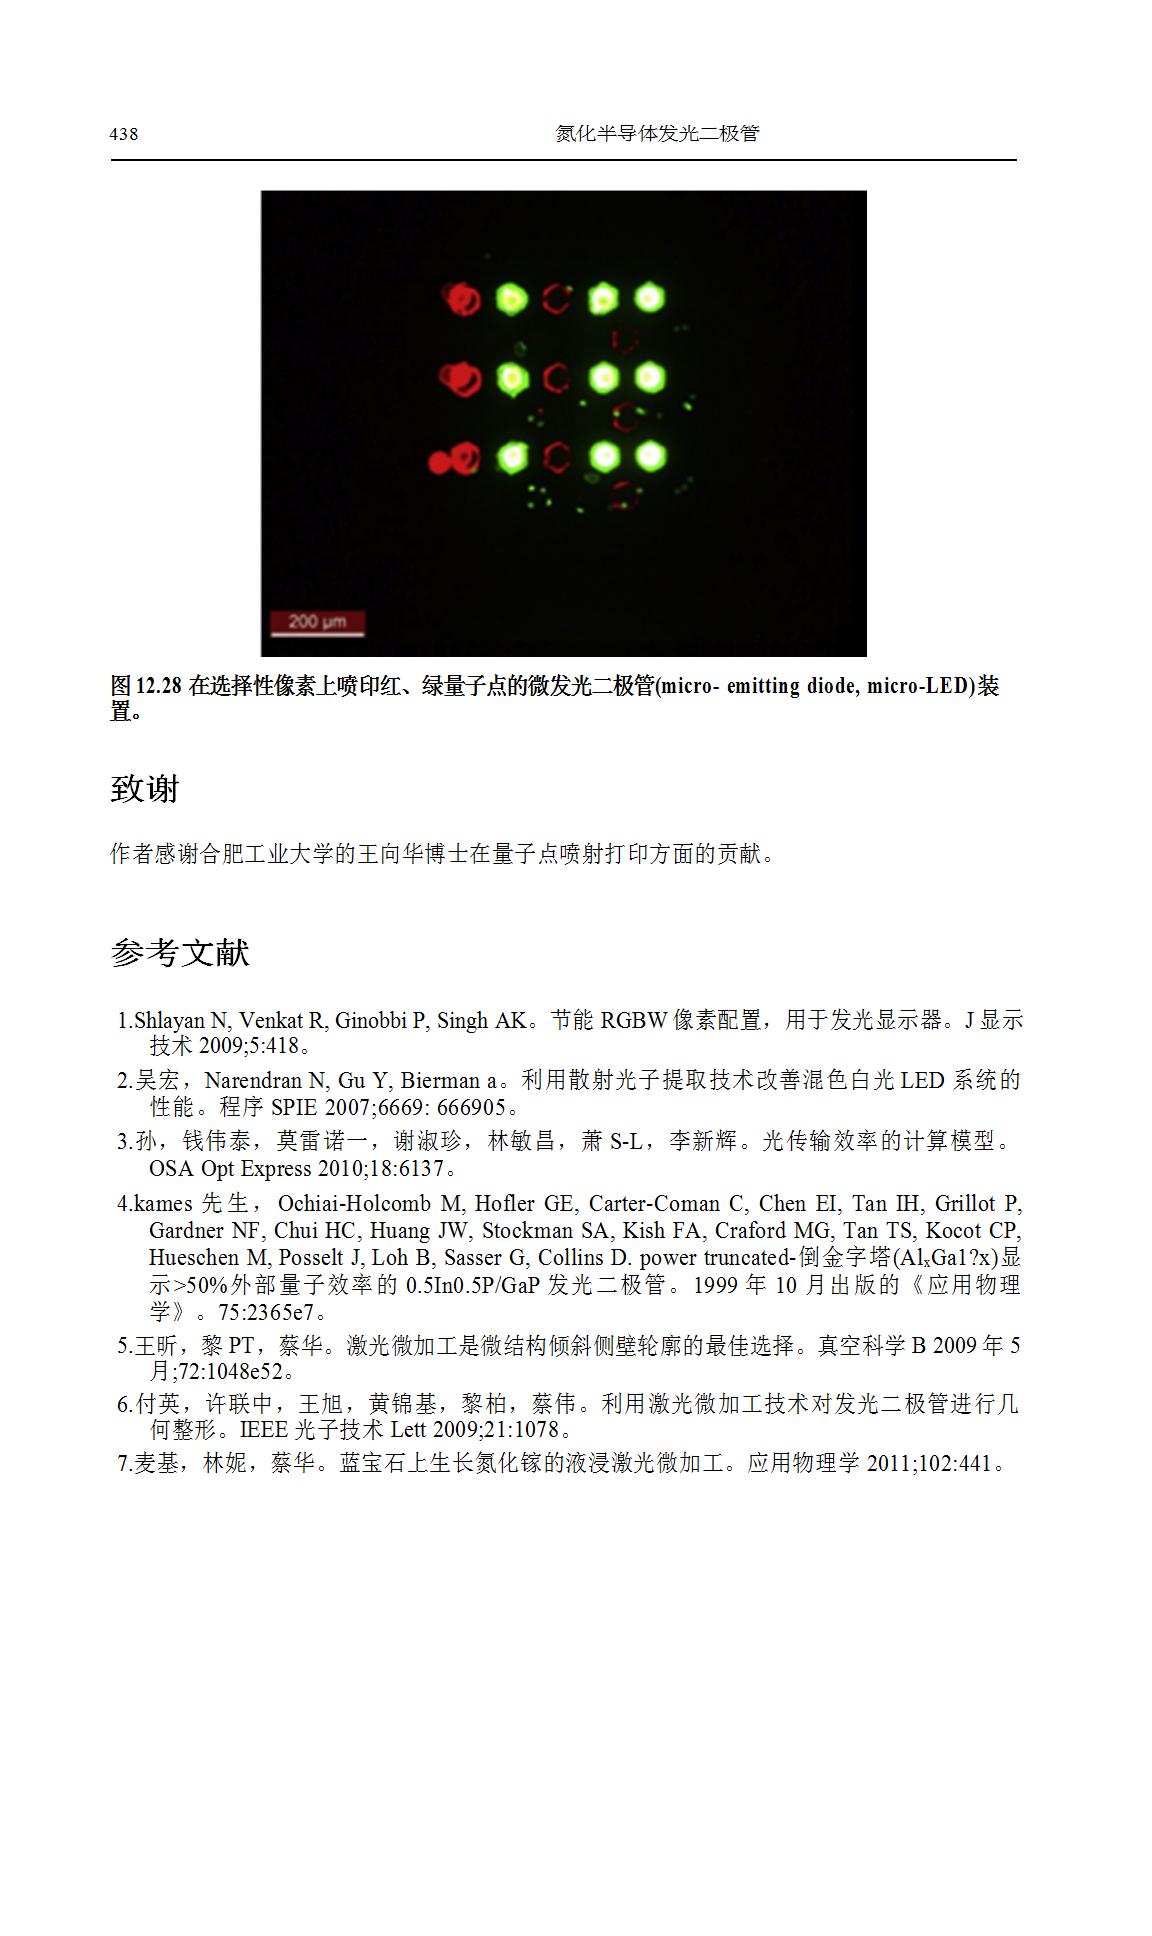 LED调色和像素化MicroLED阵列研究  第24张